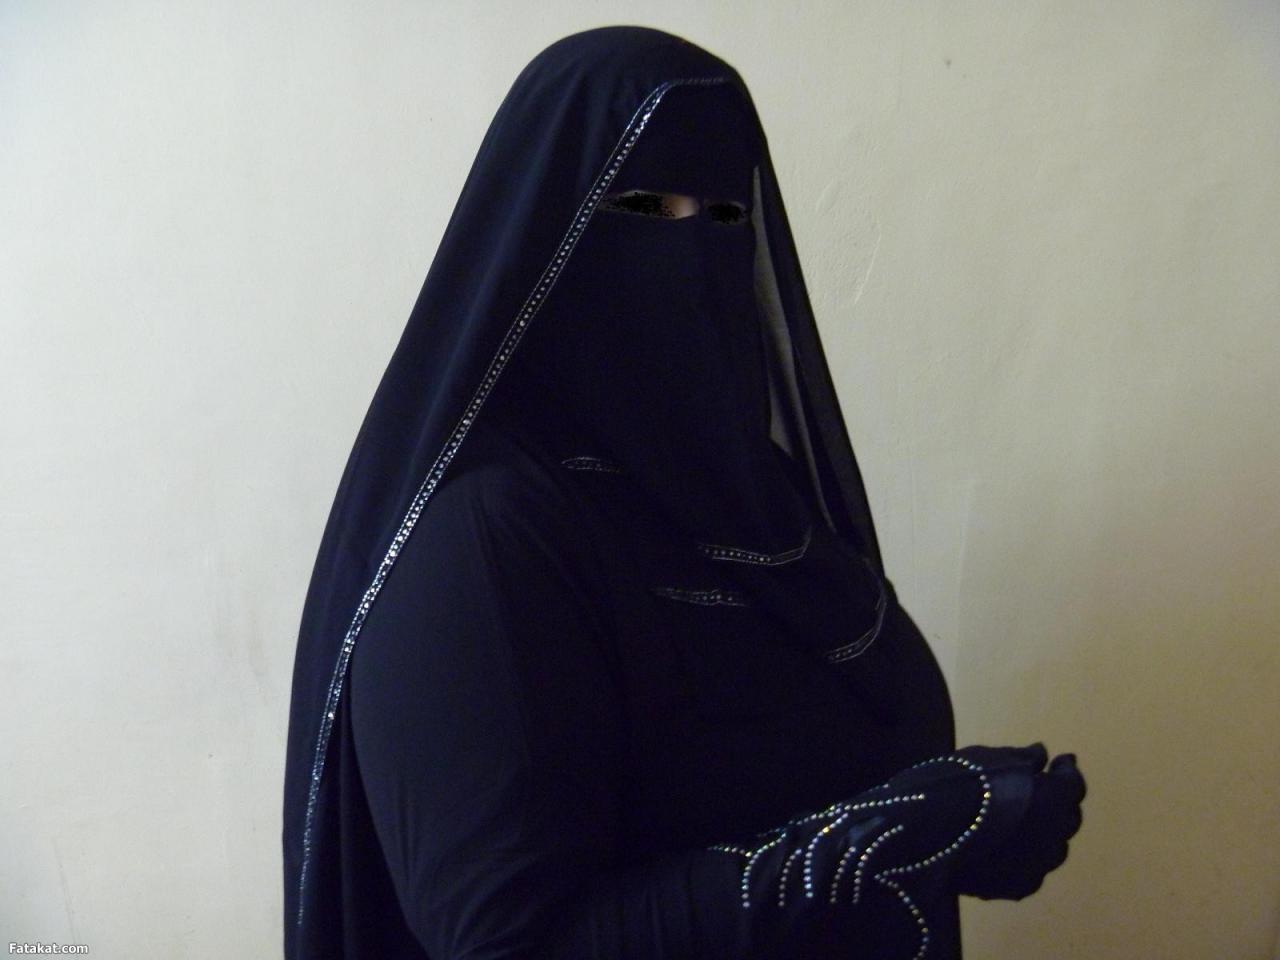 بالصور صور بنات منتقبة , جمال لبس نقاب البنات بالصور 3381 11